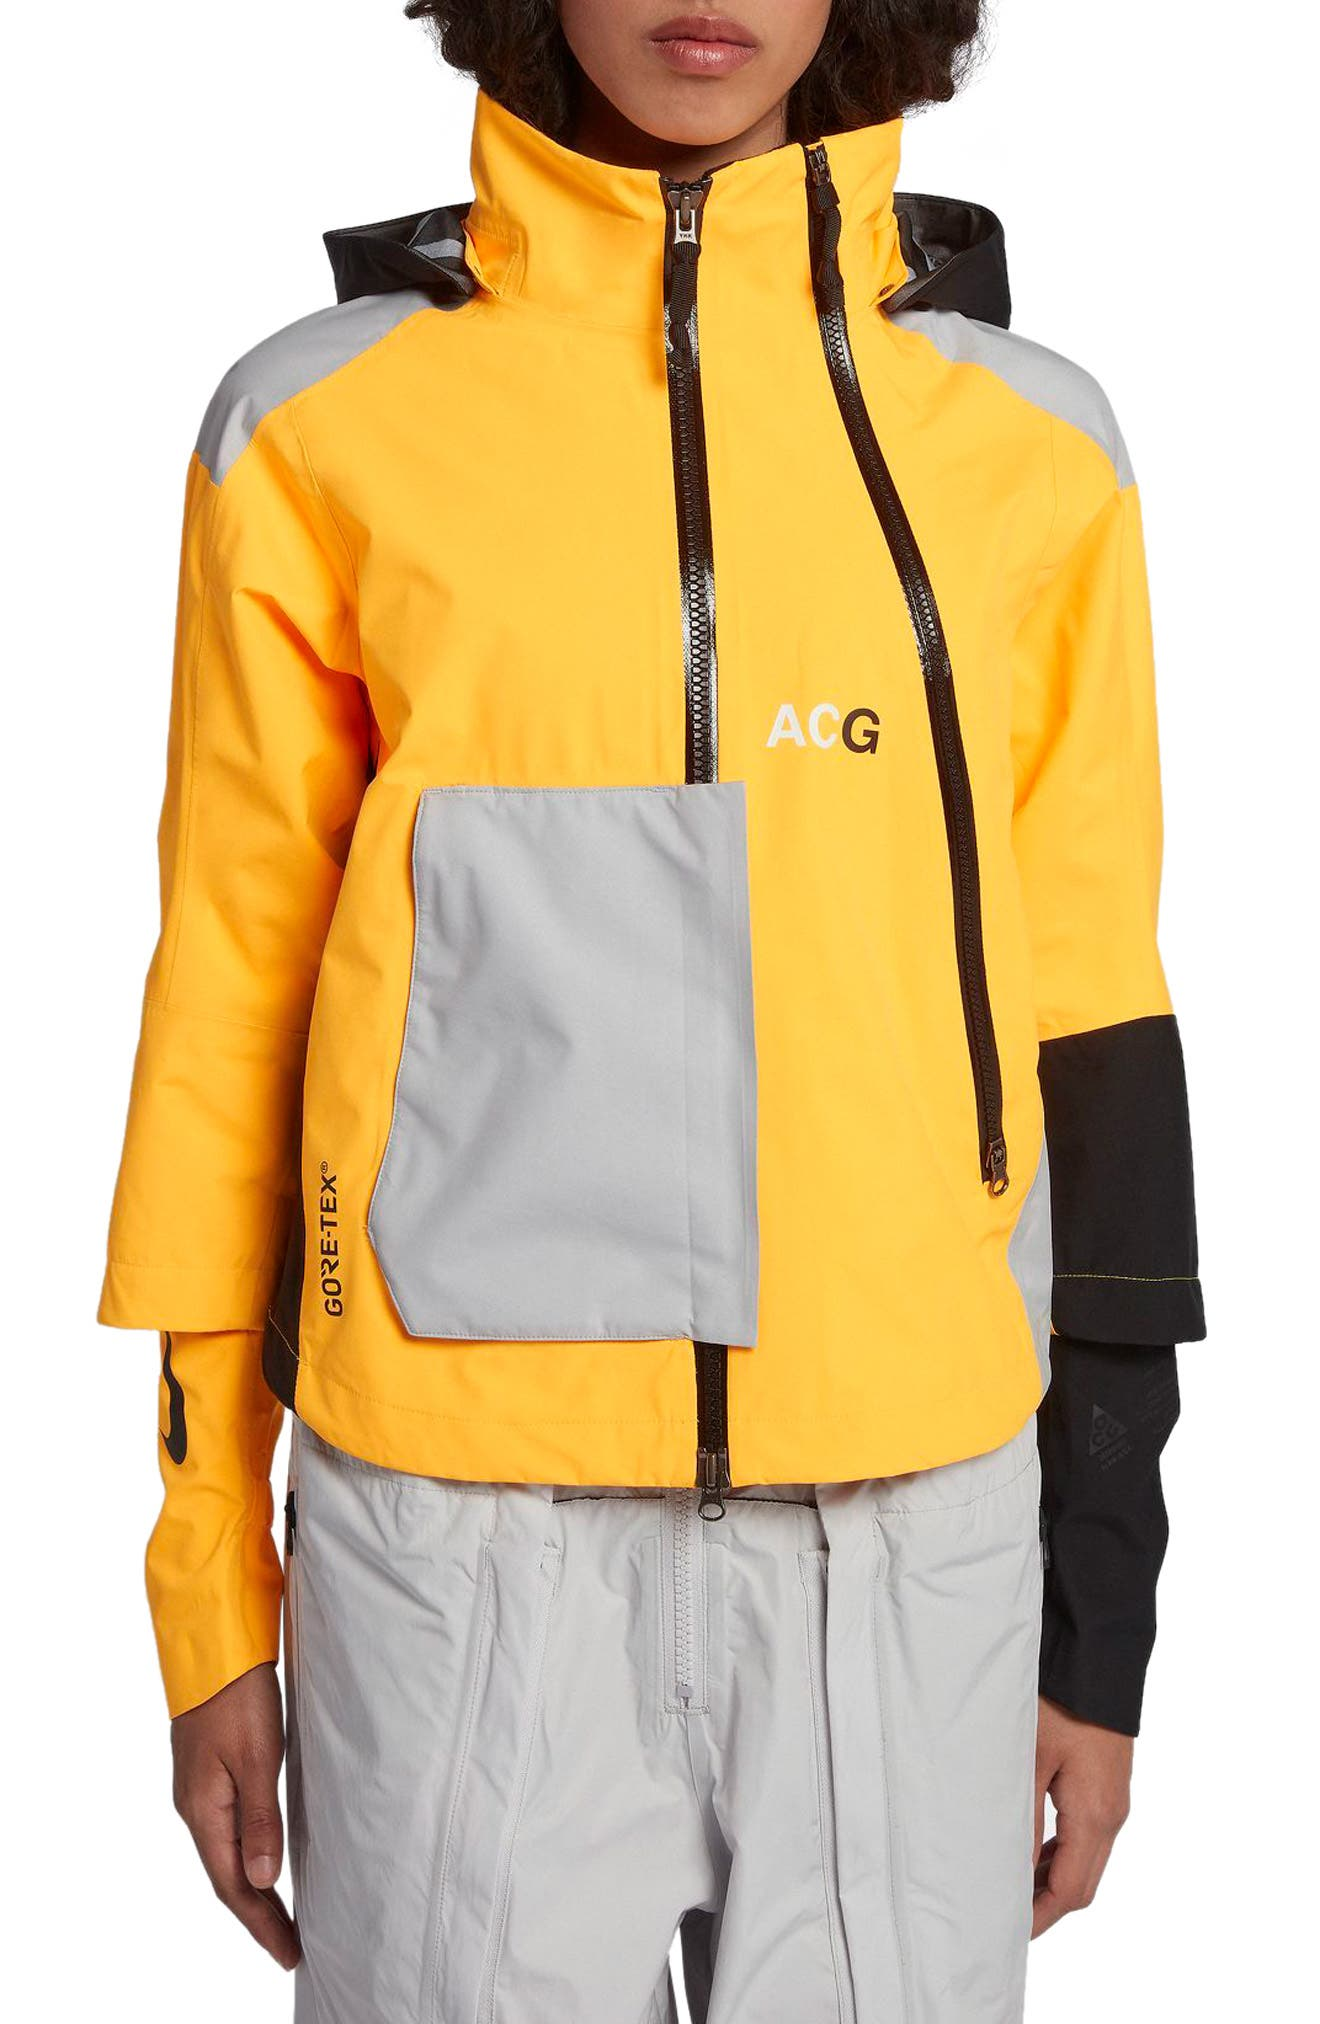 Nike NikeLab ACG Gore-Tex® Women's Jacket